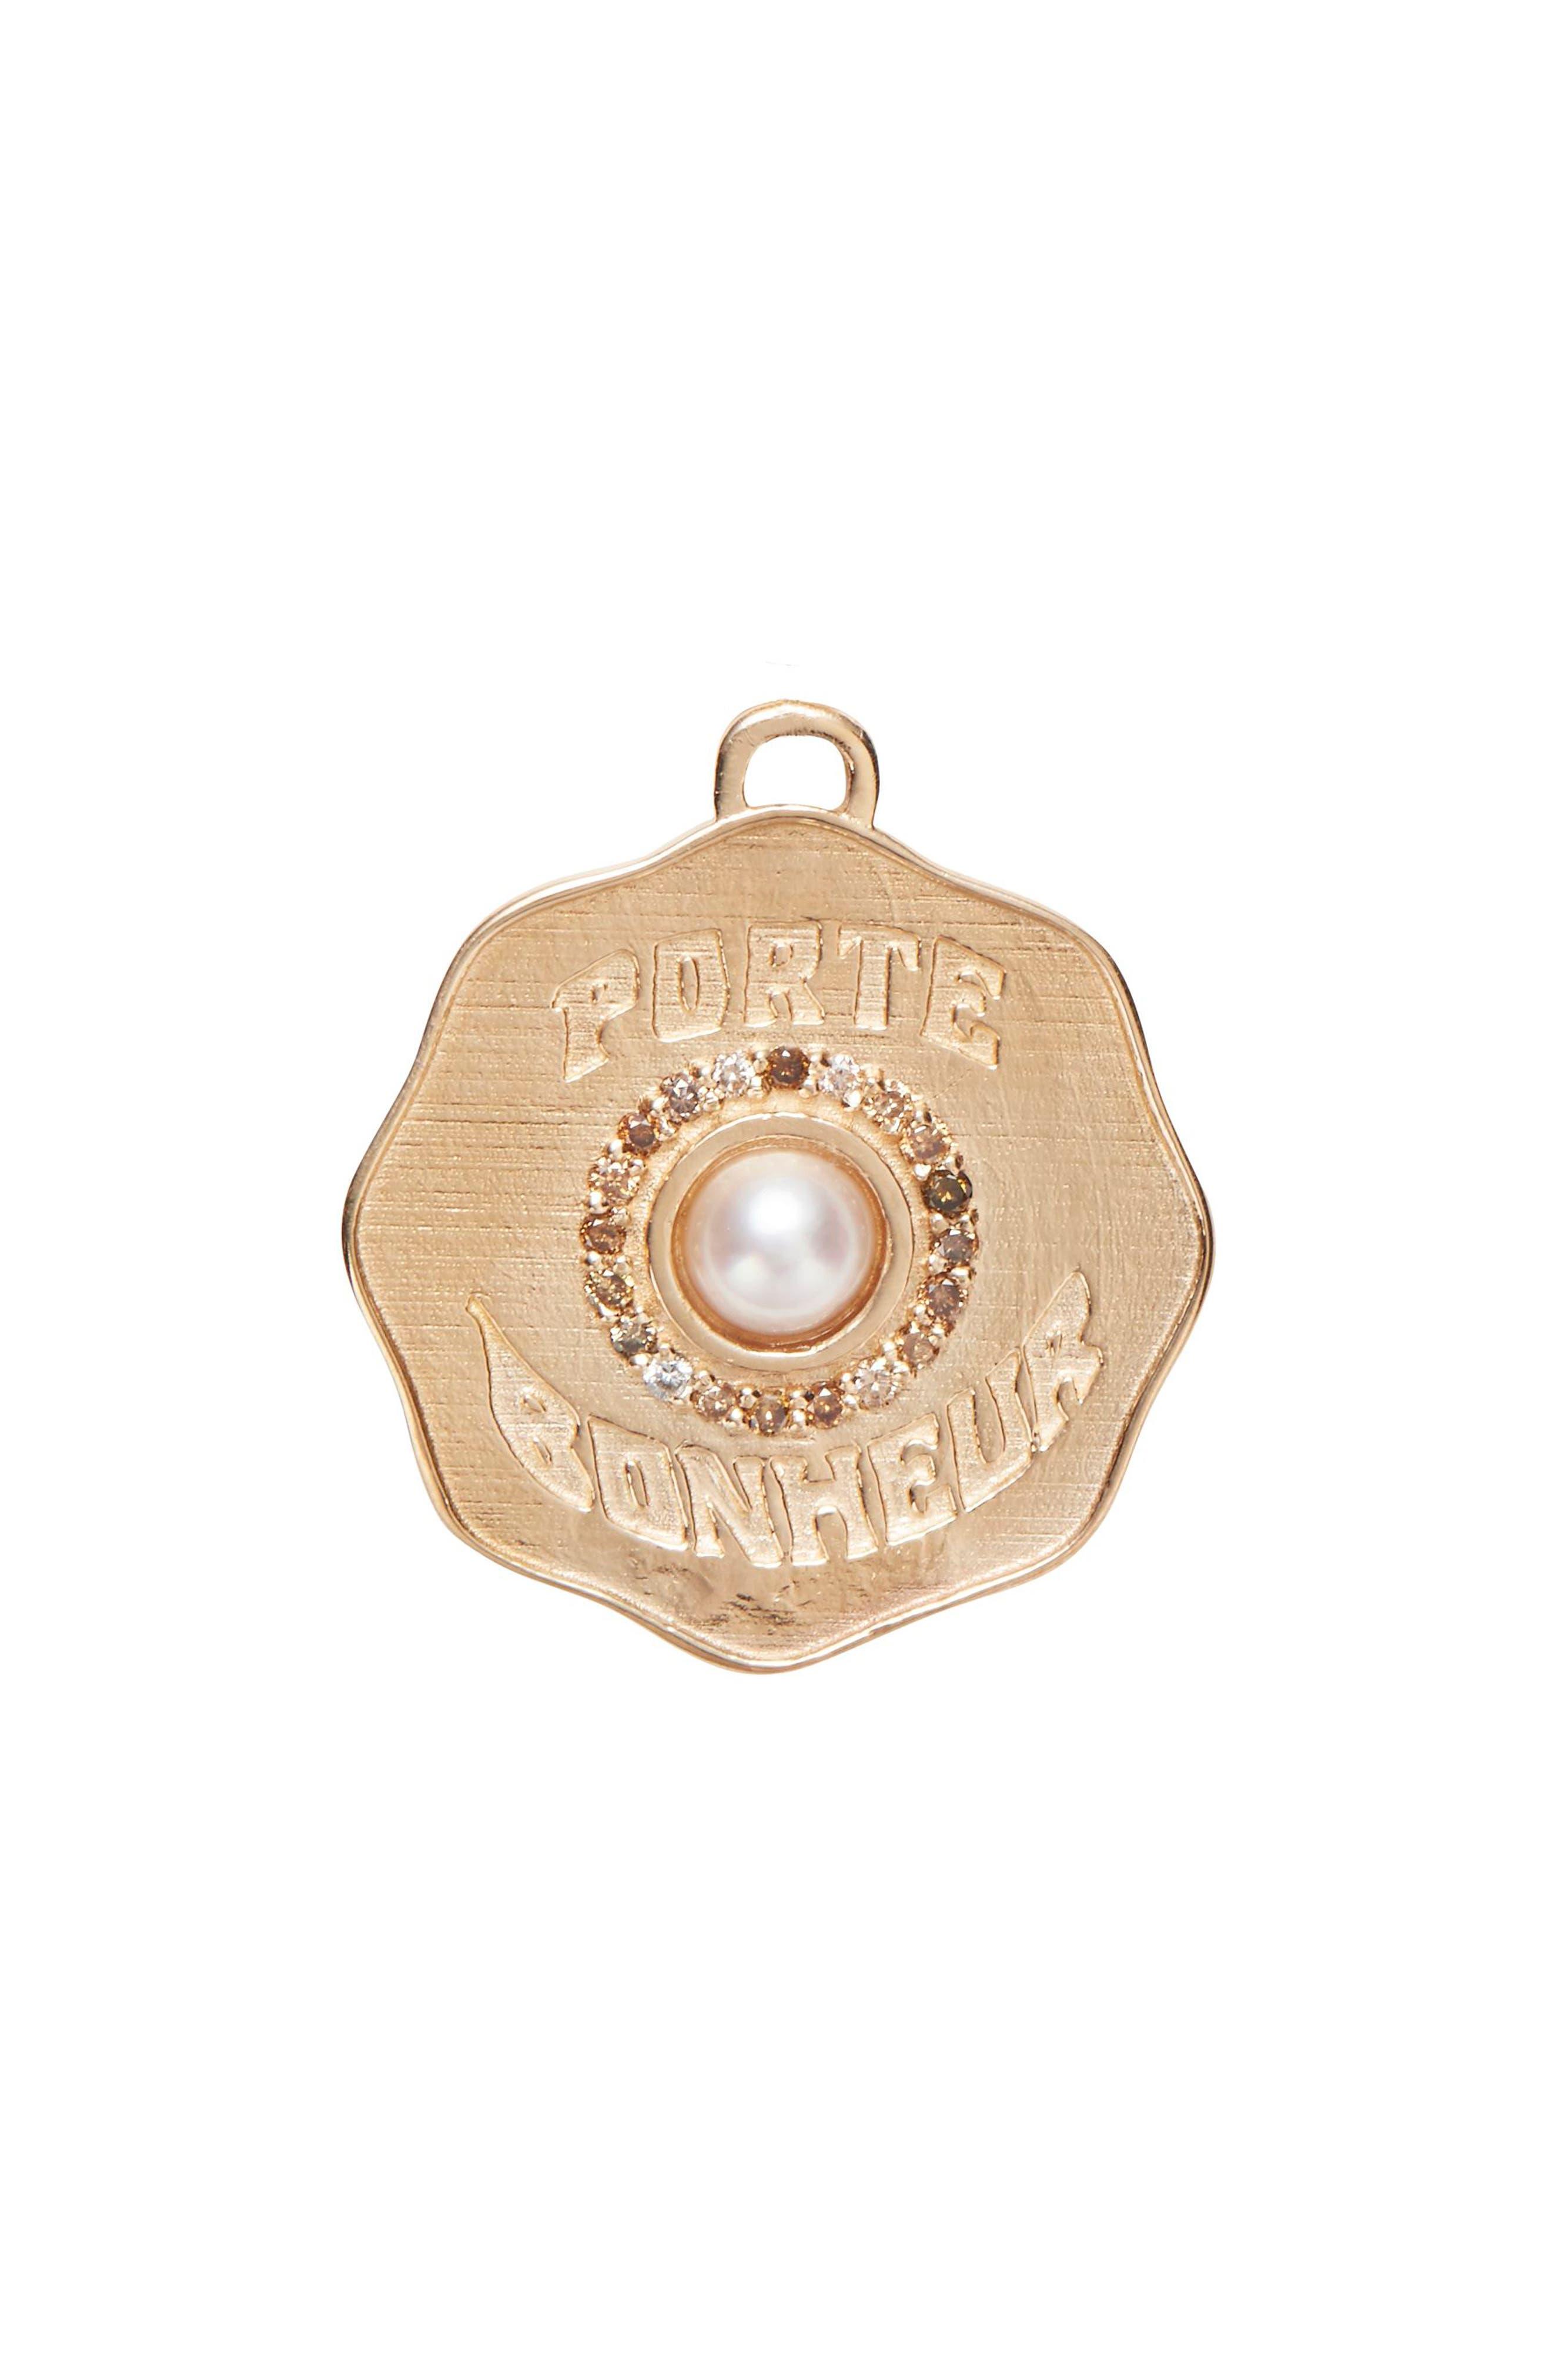 Porte Bonheur Pearl Coin Charm,                             Main thumbnail 1, color,                             Yellow Gold